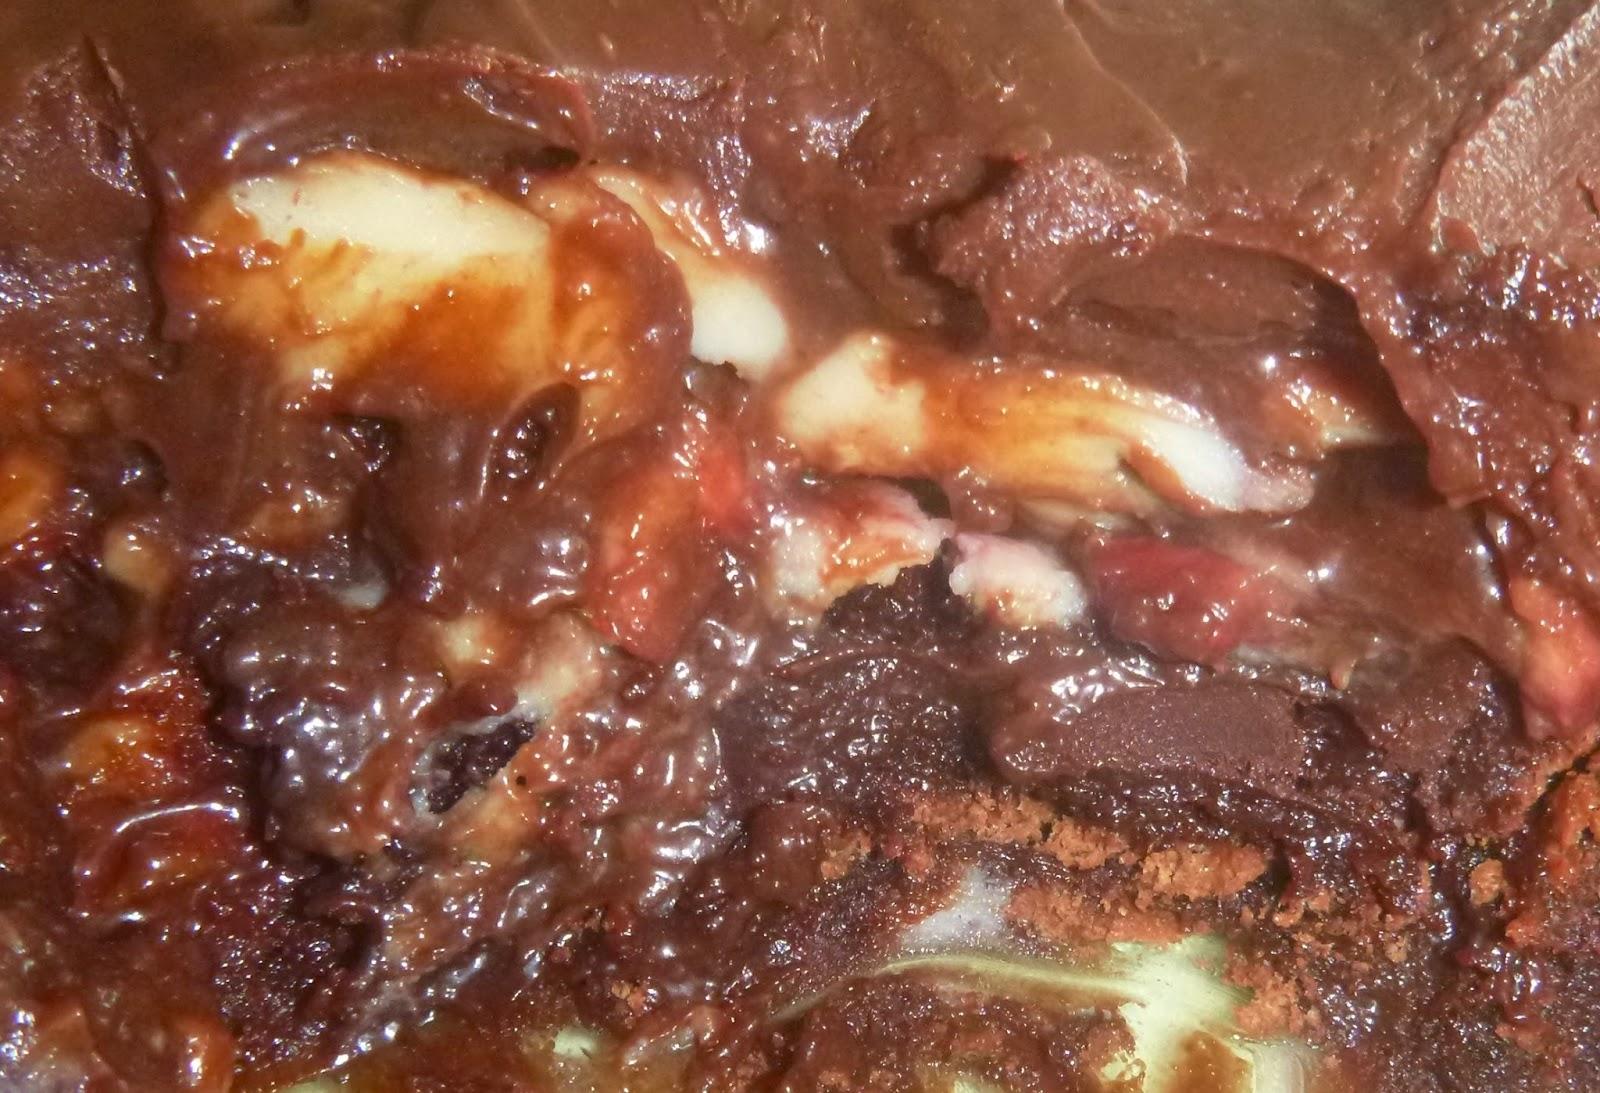 sobremesa de CHOCOLATE; CHOCLATE; MORANGOS; GANACHE